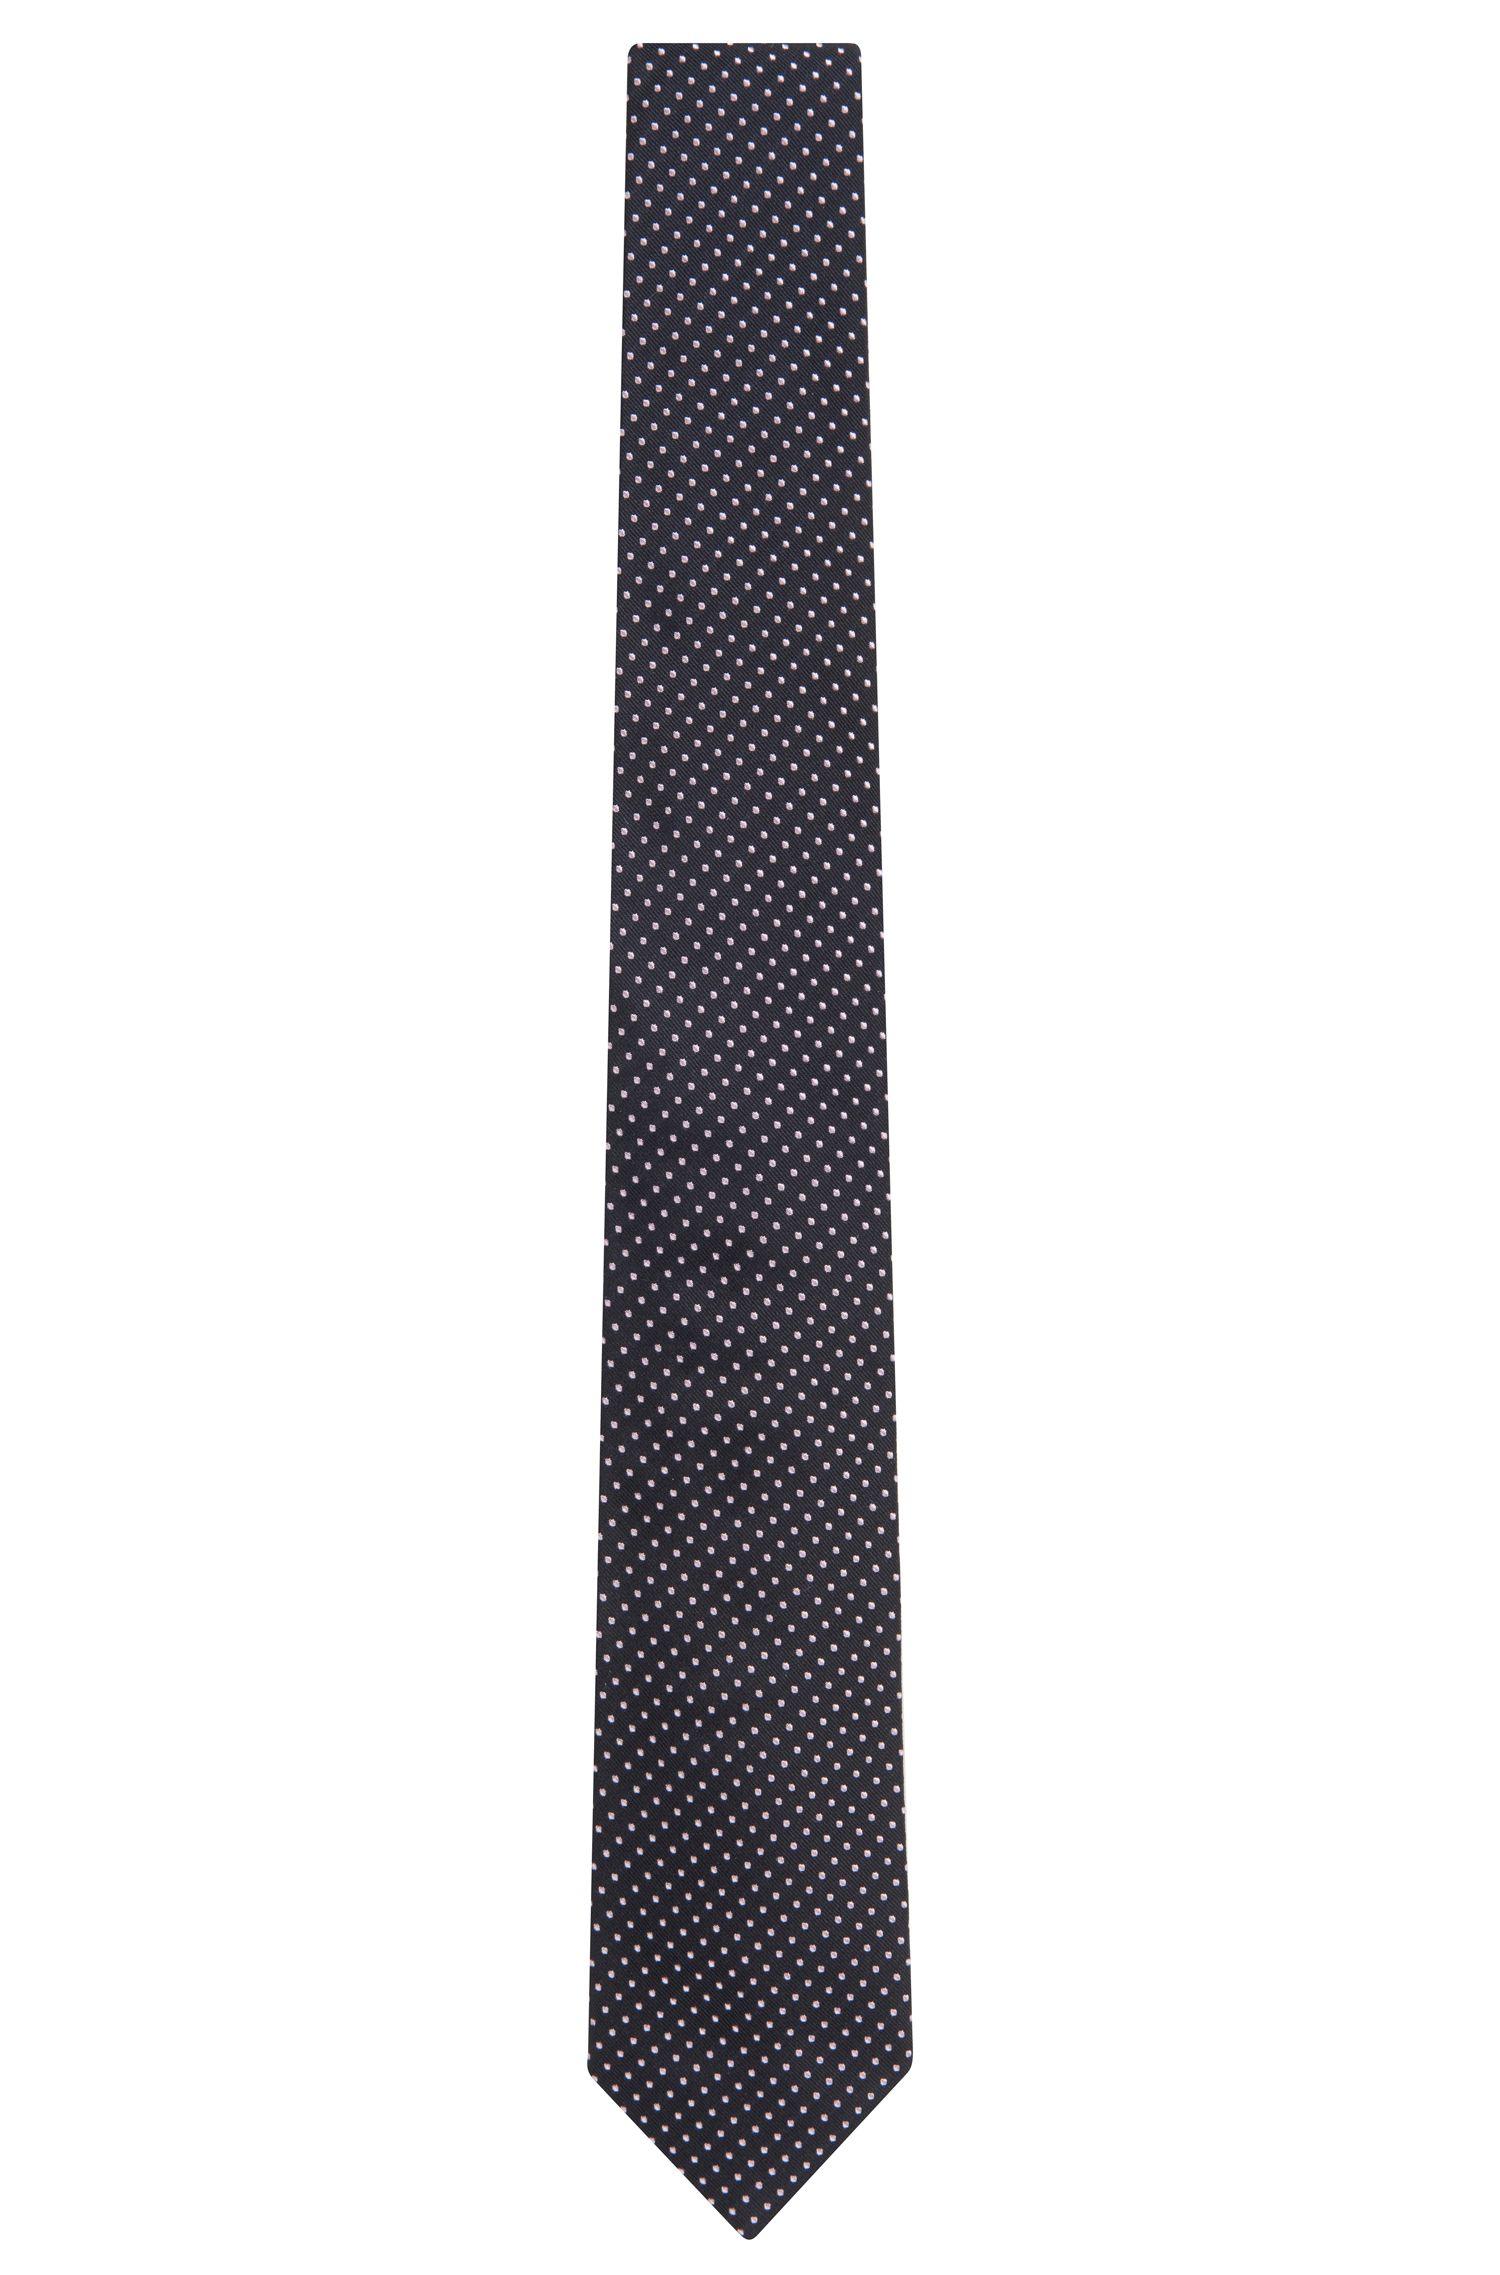 Pin Dot Embroidered Italian Silk Tie, Regular | Tie 7.5 cm